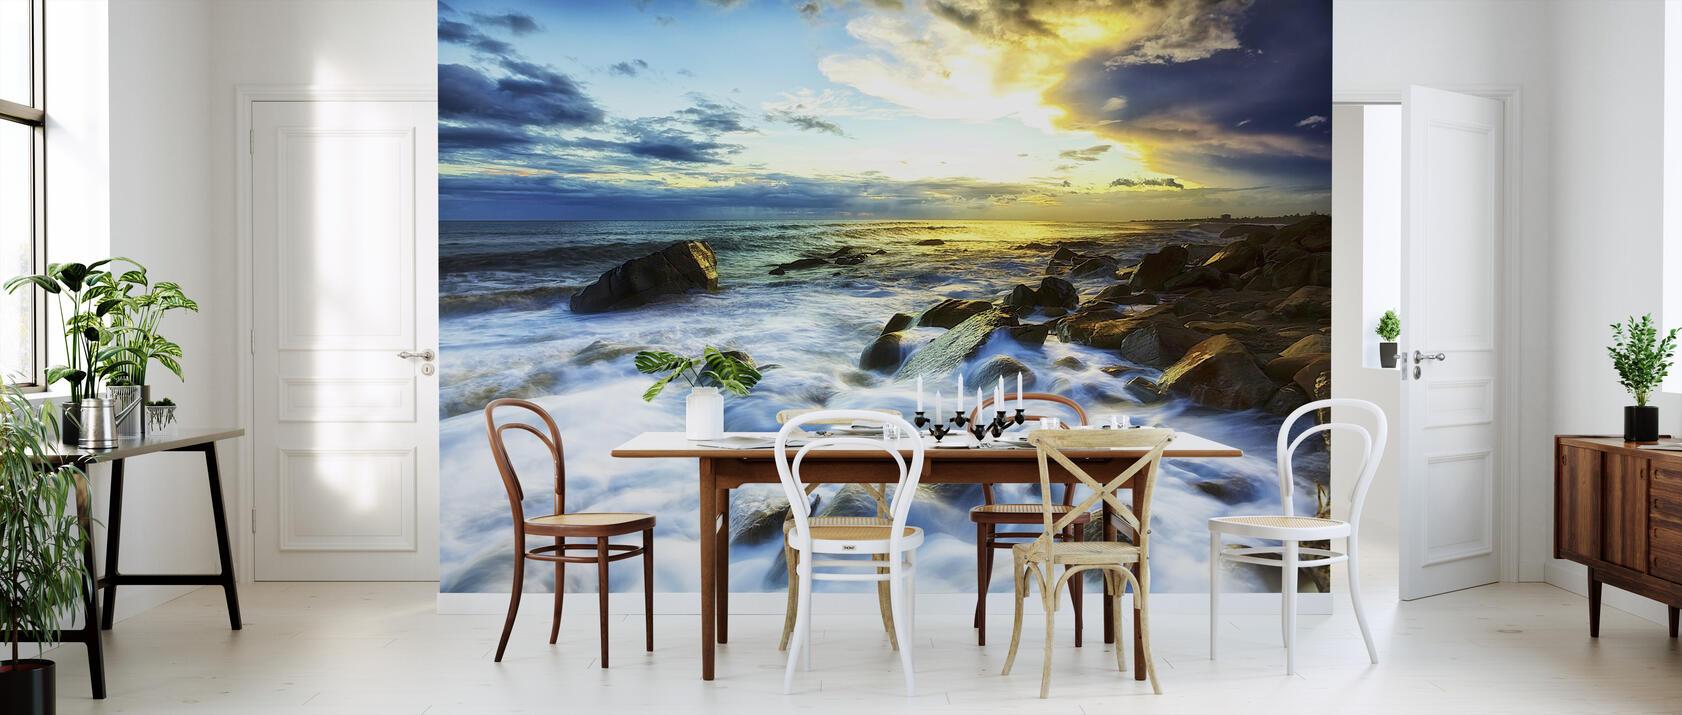 waves crashing fototapete nach ma photowall. Black Bedroom Furniture Sets. Home Design Ideas